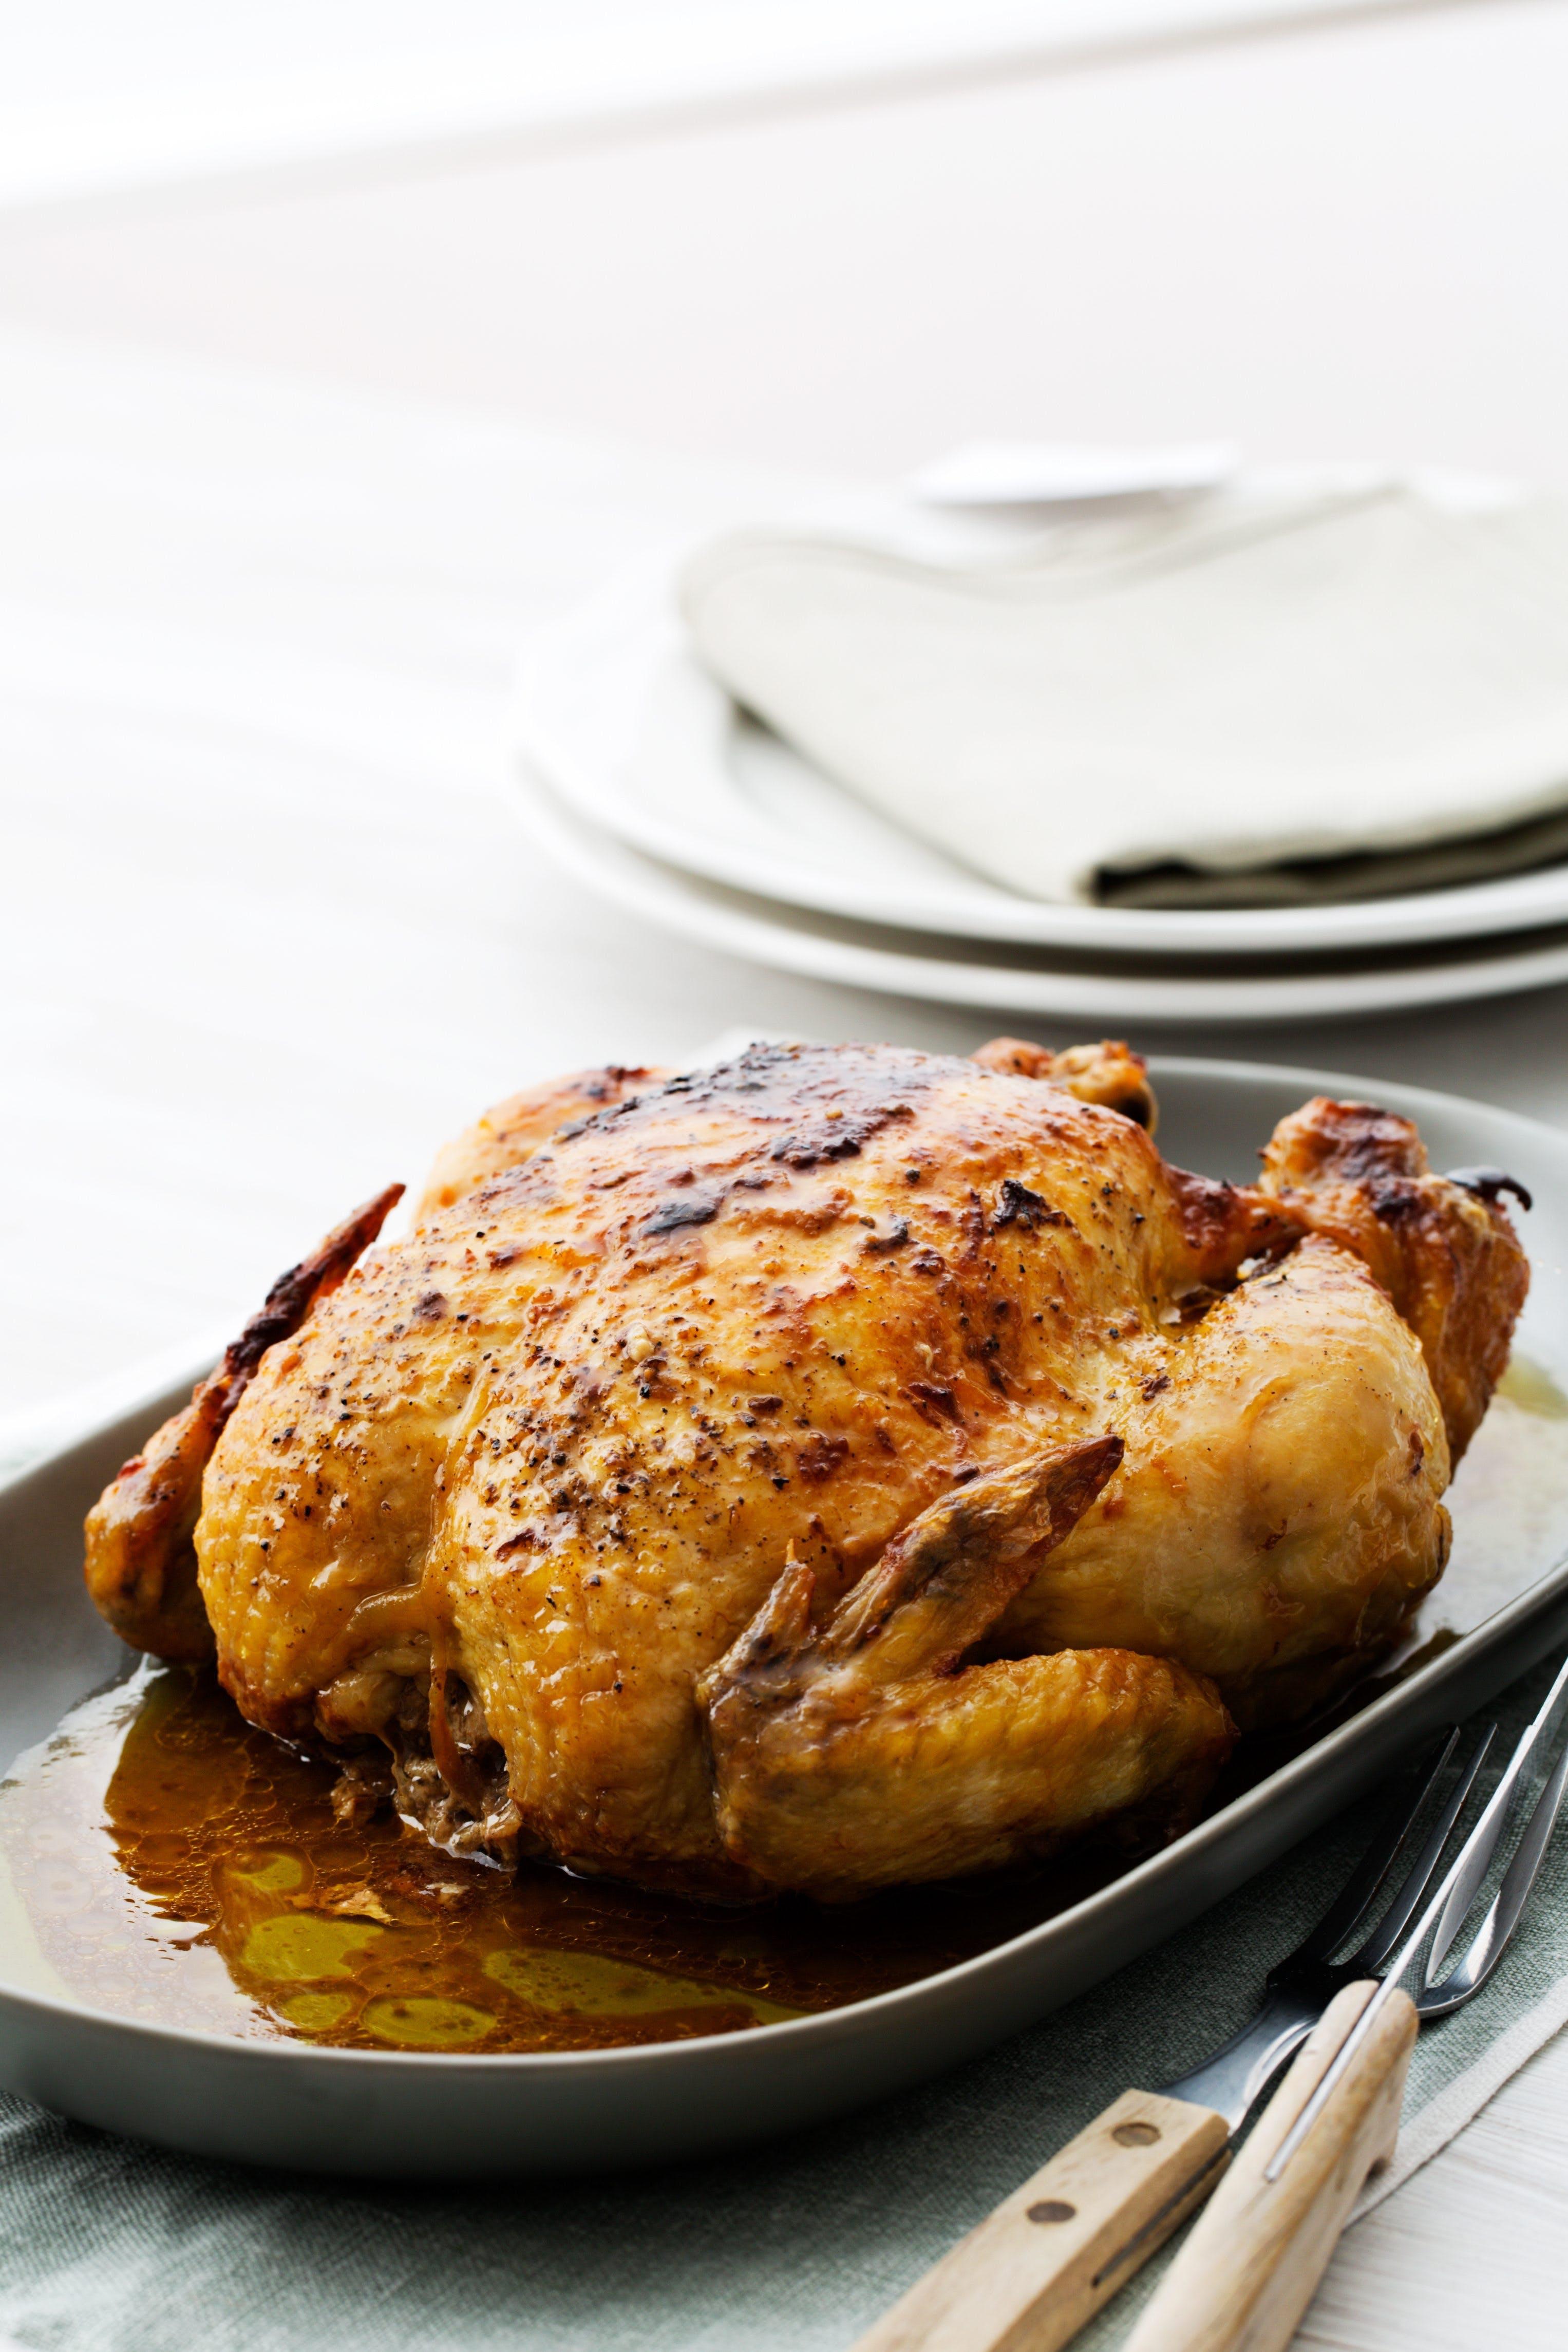 Keto oven-baked chicken in garlic butter